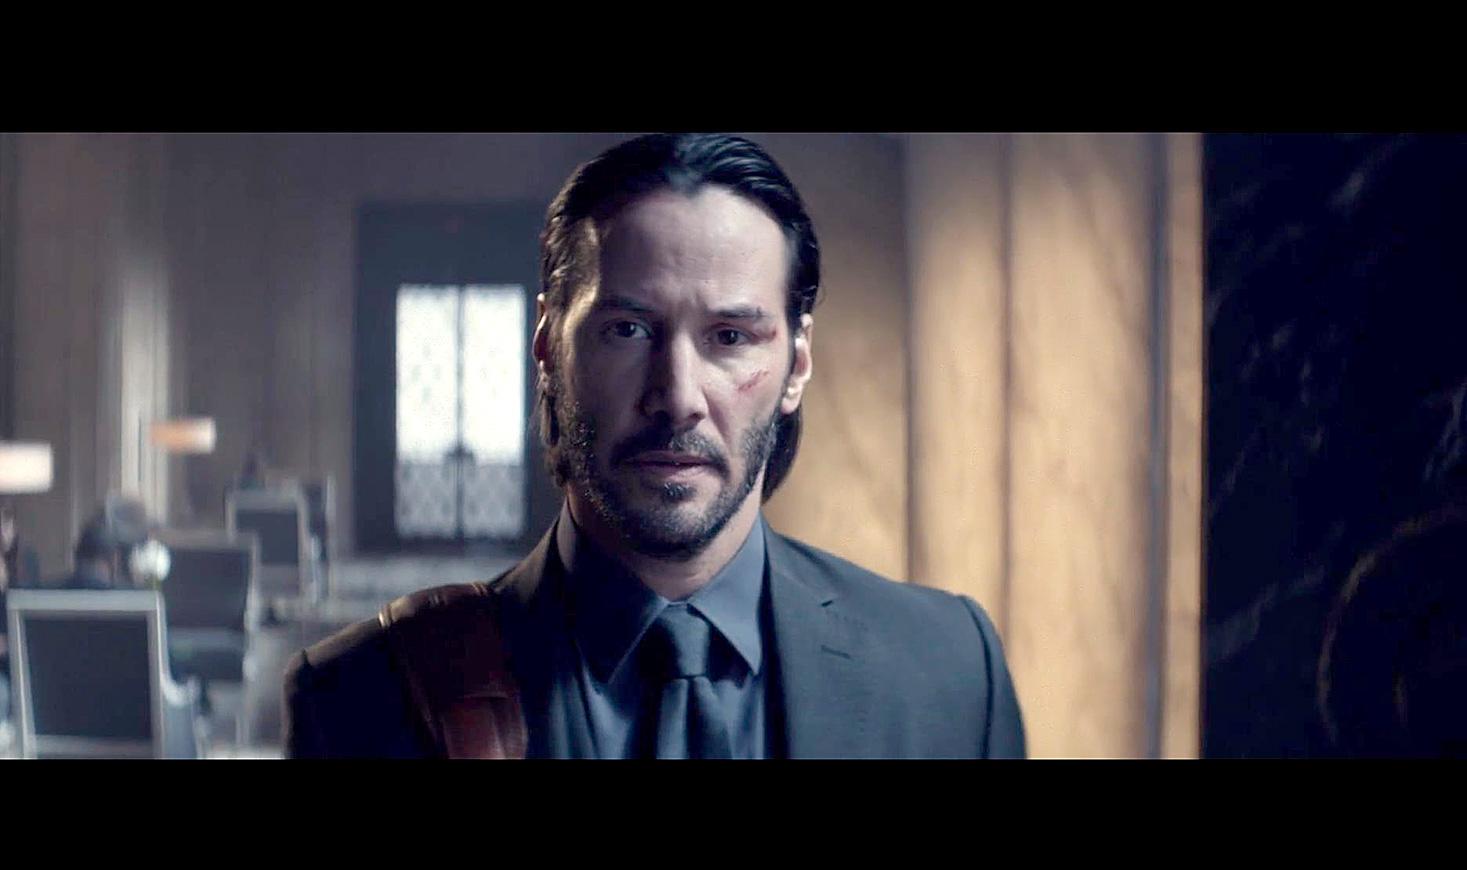 John Wick. Sumber: Cuplikan layar dari film